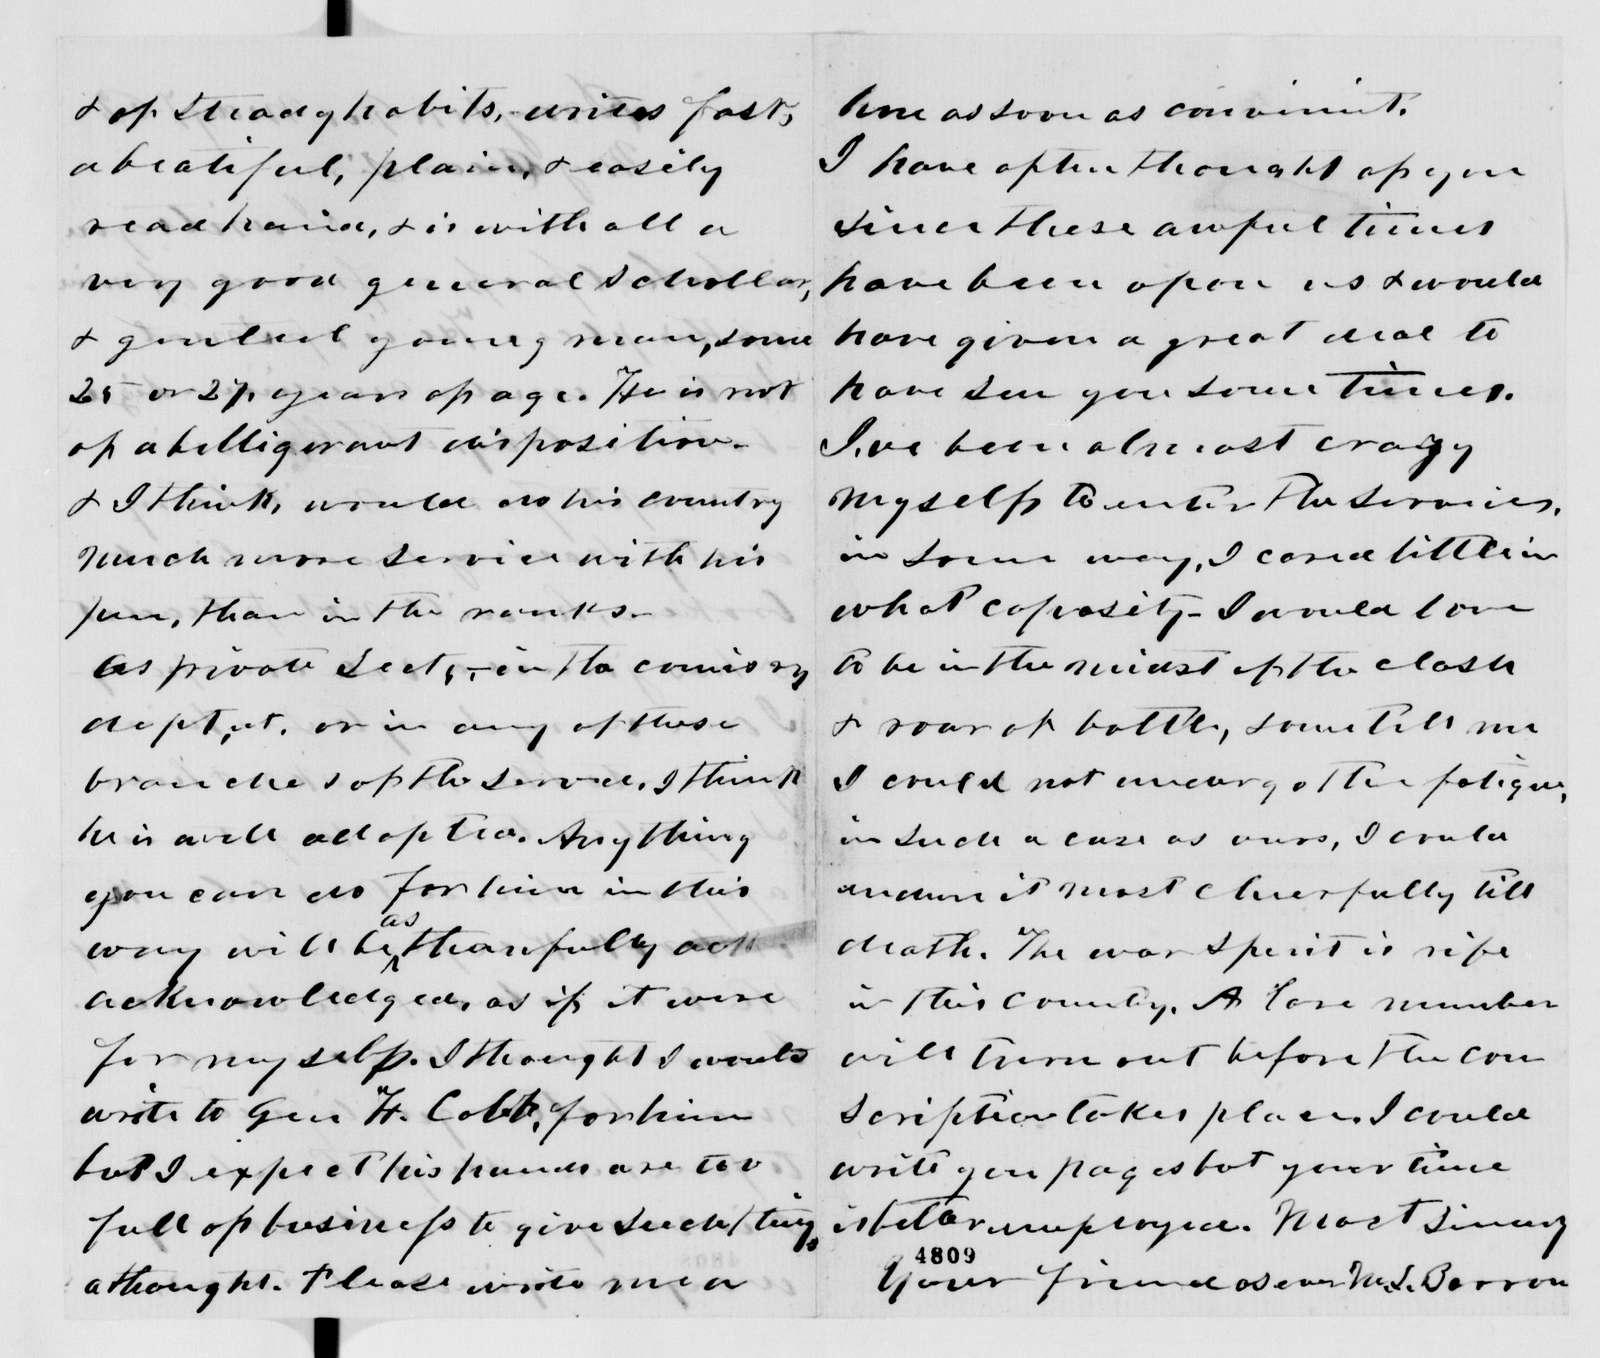 Alexander Hamilton Stephens Papers: General Correspondence, 1784-1886; 1862, Apr. 30-June 18